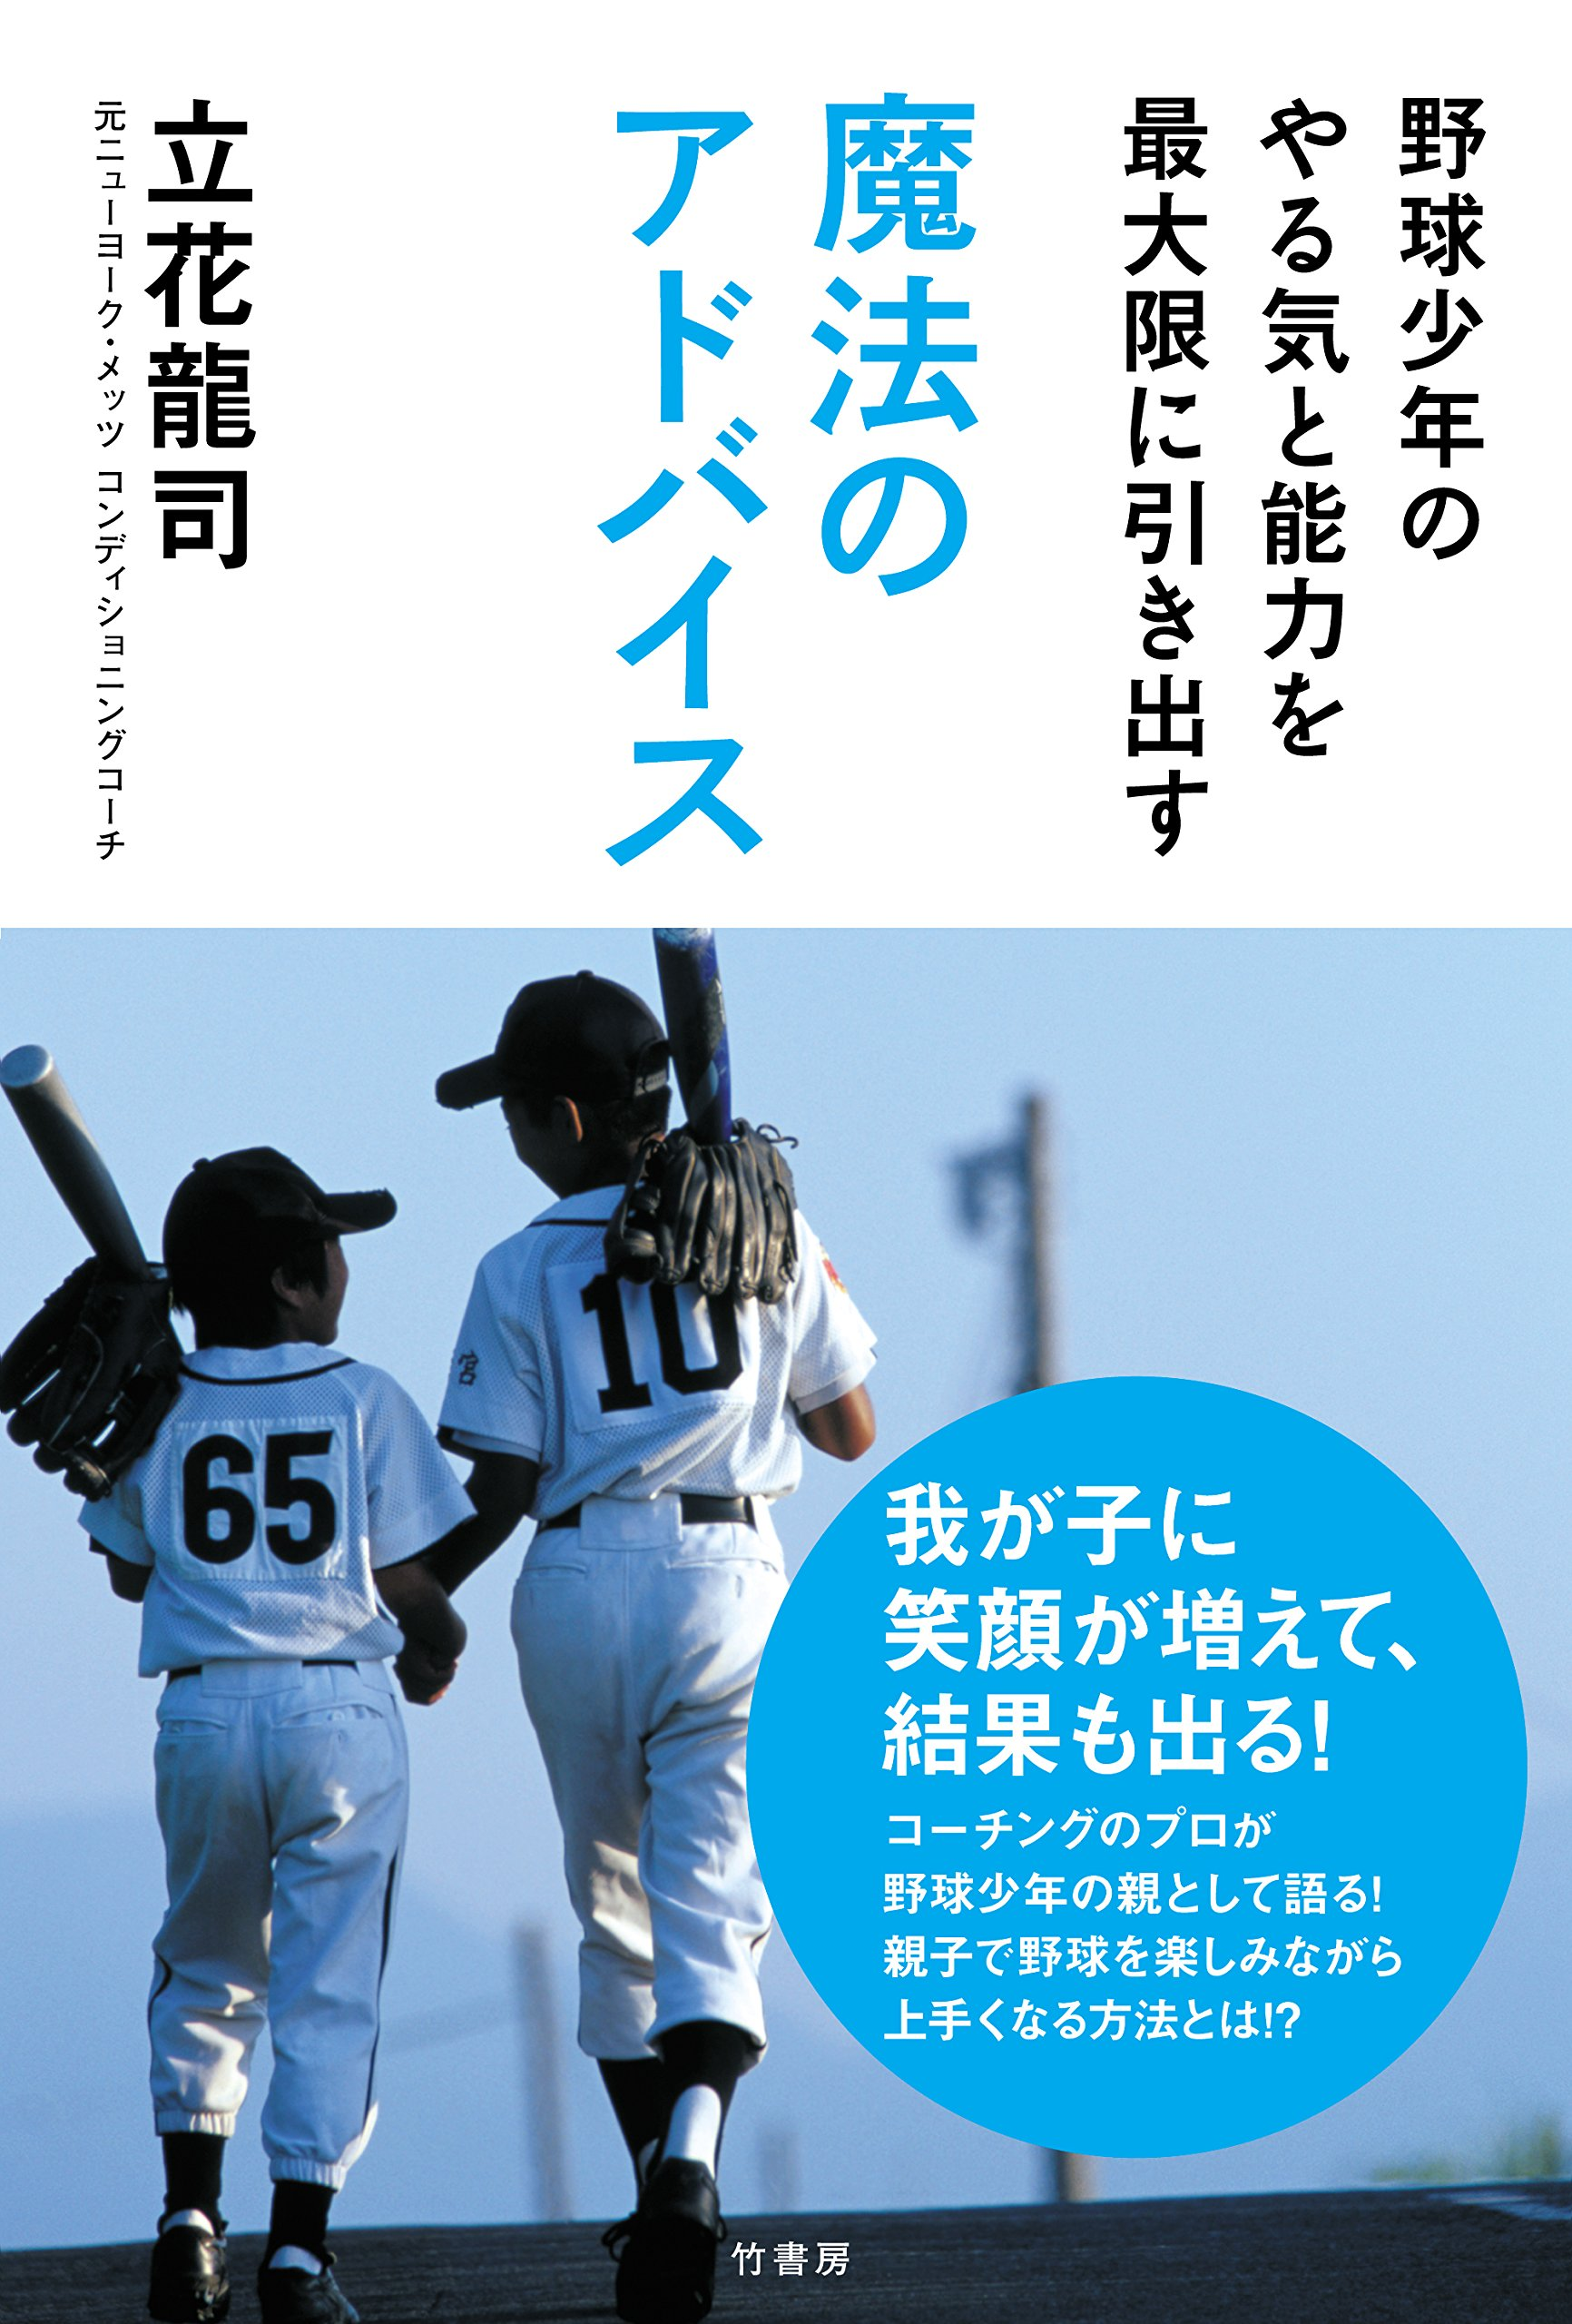 Mua ことだま 野球魂を熱くする名言集 単行本 Tren Amazon Nhật